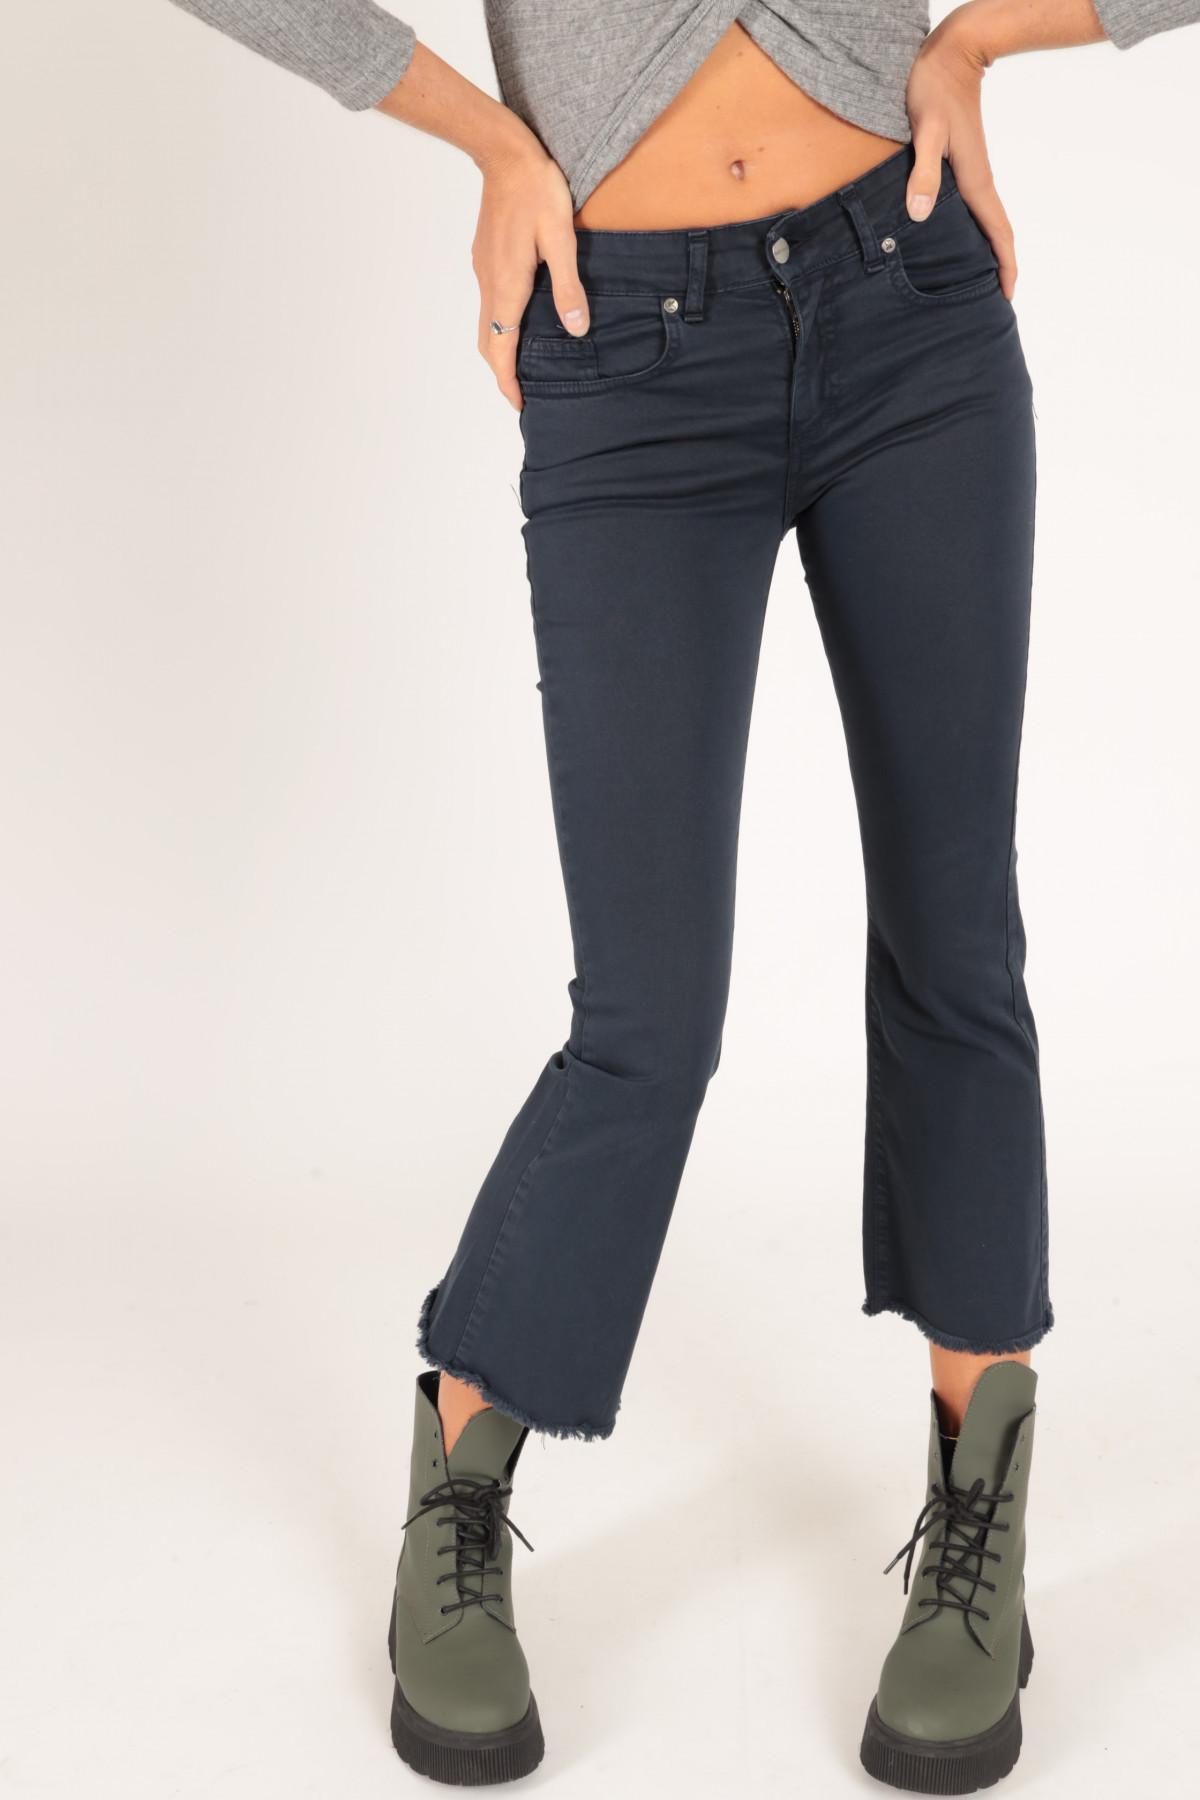 Garment Dyed 5 Pockets Trumpet Jeans